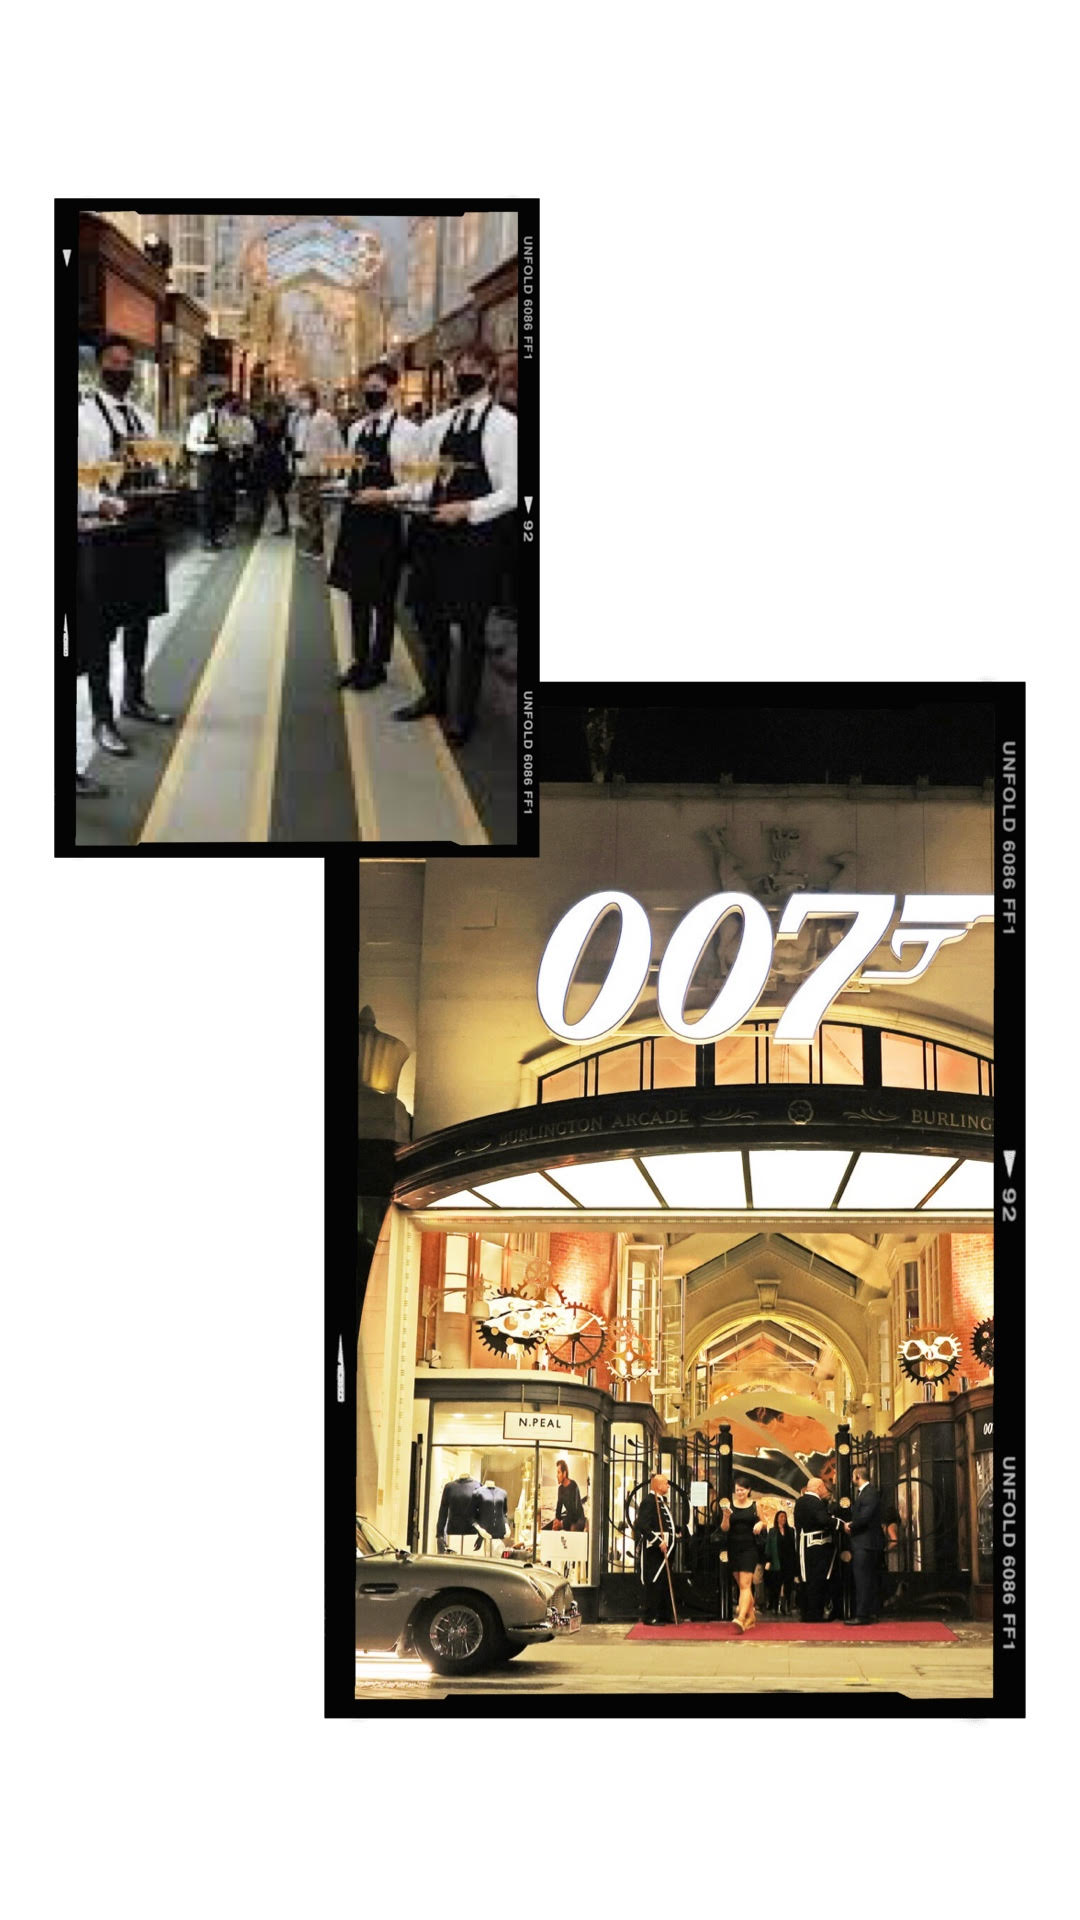 """Bollinger 007 Bar"" Launches in London's Historic Burlington Arcade"